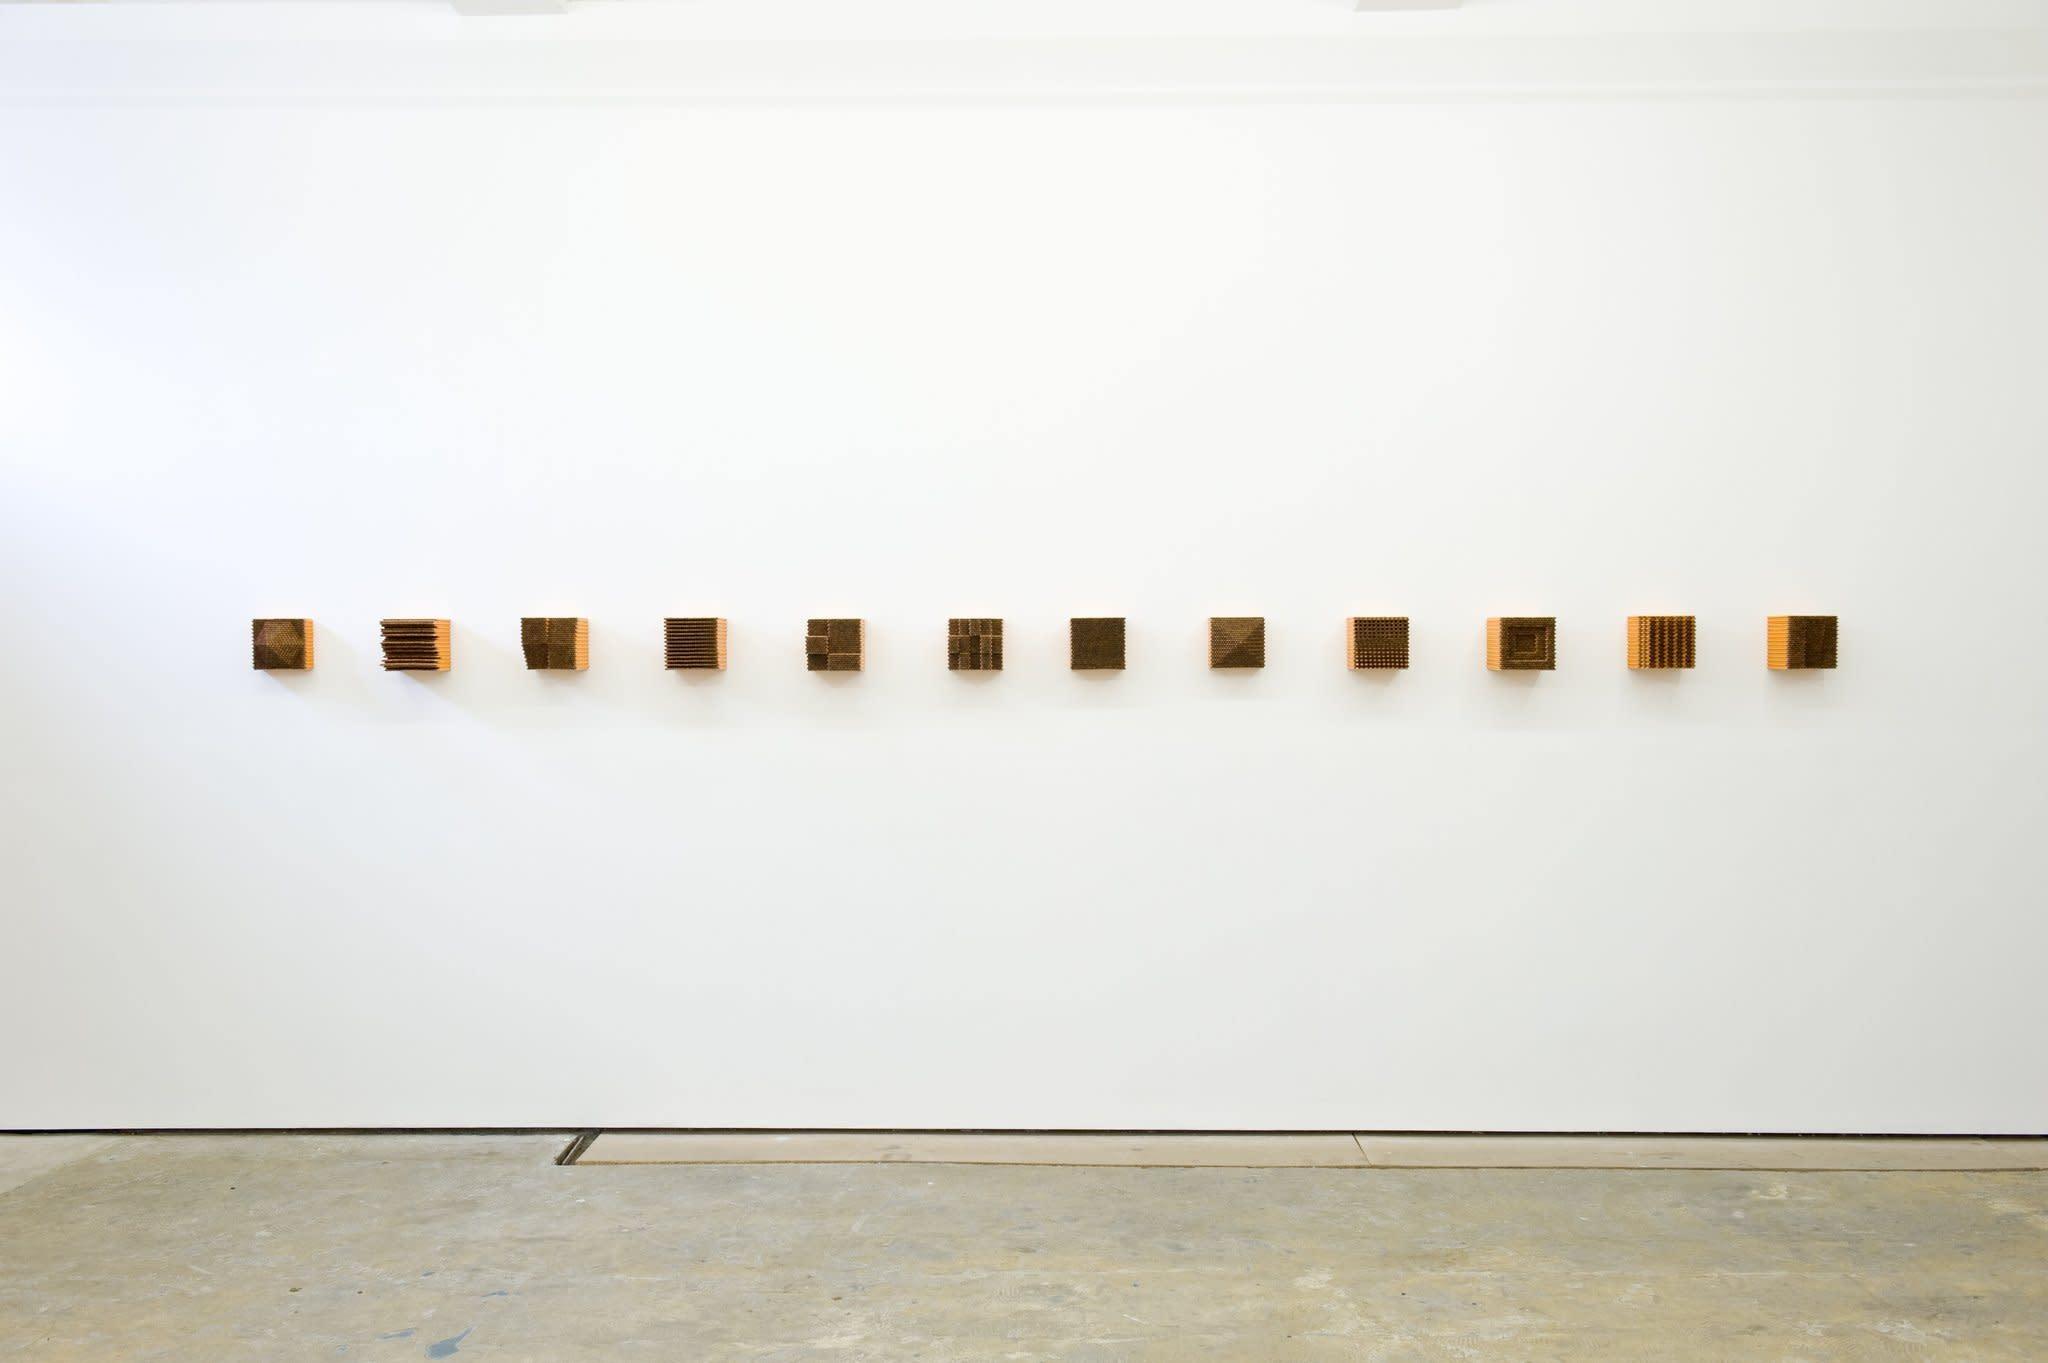 <span class=&#34;link fancybox-details-link&#34;><a href=&#34;/artists/44-jacob-dahlgren/works/7427/&#34;>View Detail Page</a></span><div class=&#34;artist&#34;><strong>Jacob Dahlgren</strong></div> <div class=&#34;title&#34;><em>Item 10, 12, 13, 14, 15, 17, 19, 20, 21, 22, 23, & 24; Subject of Art</em>, 2012</div> <div class=&#34;medium&#34;>Pencils</div> <div class=&#34;dimensions&#34;>each 17.5 x 17.5 x 17.5 cm<br />6 7/8 x 6 7/8 x 6 7/8 in</div><div class=&#34;copyright_line&#34;>Copyright The Artist</div>